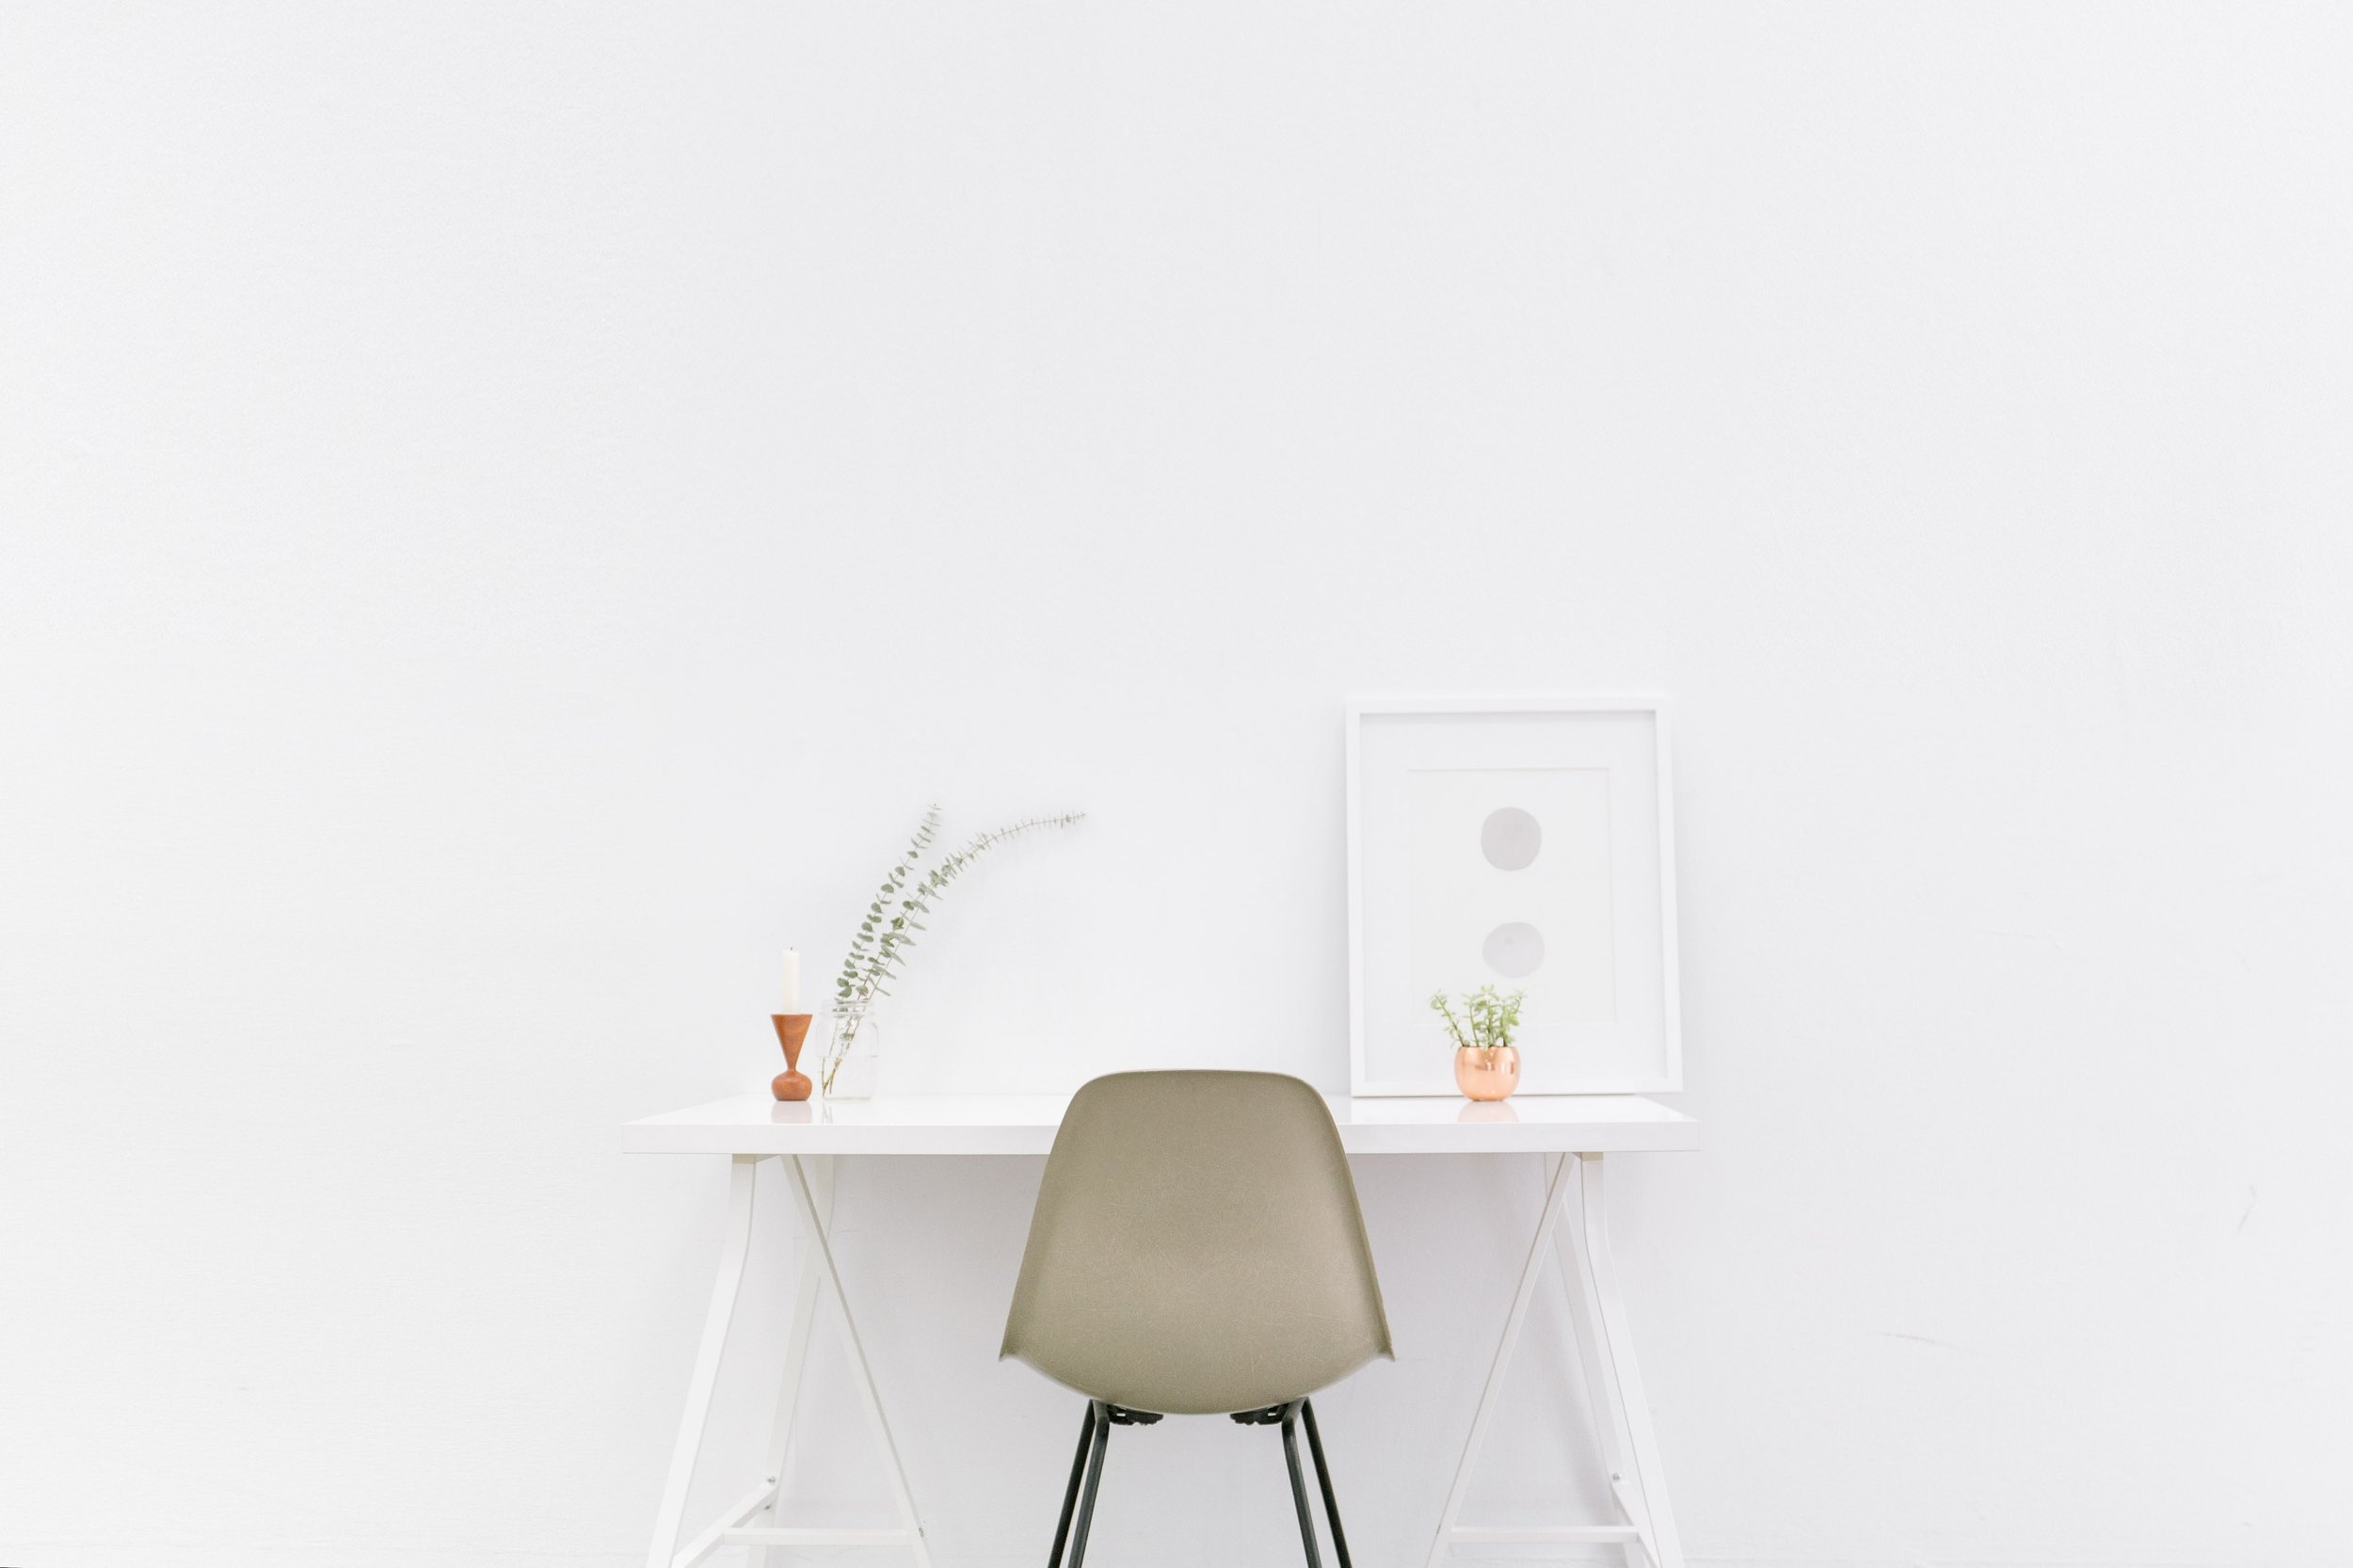 bench-accounting-49909.jpg